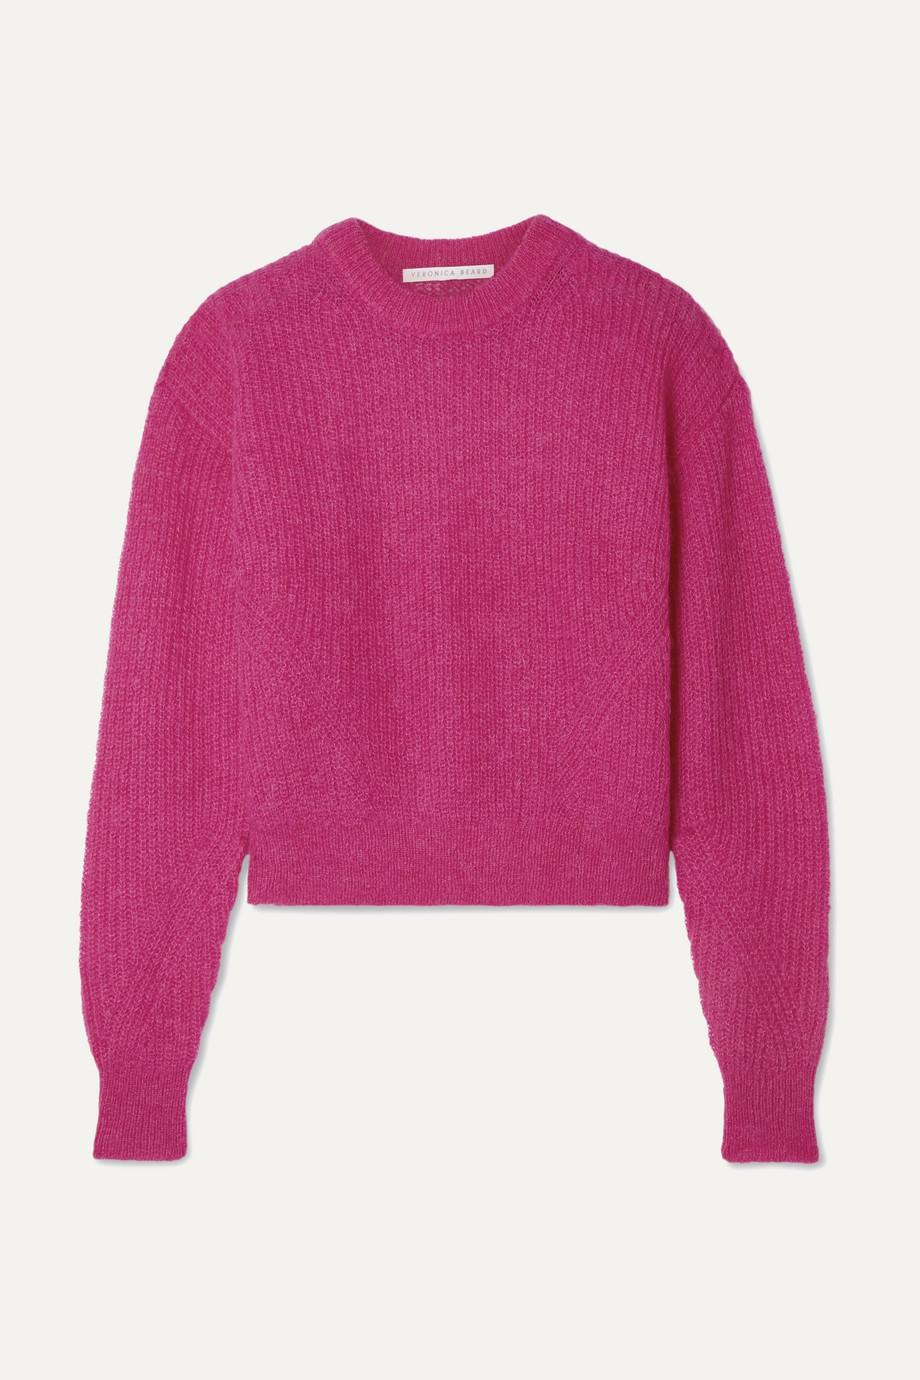 Veronica Beard Melinda 针织毛衣